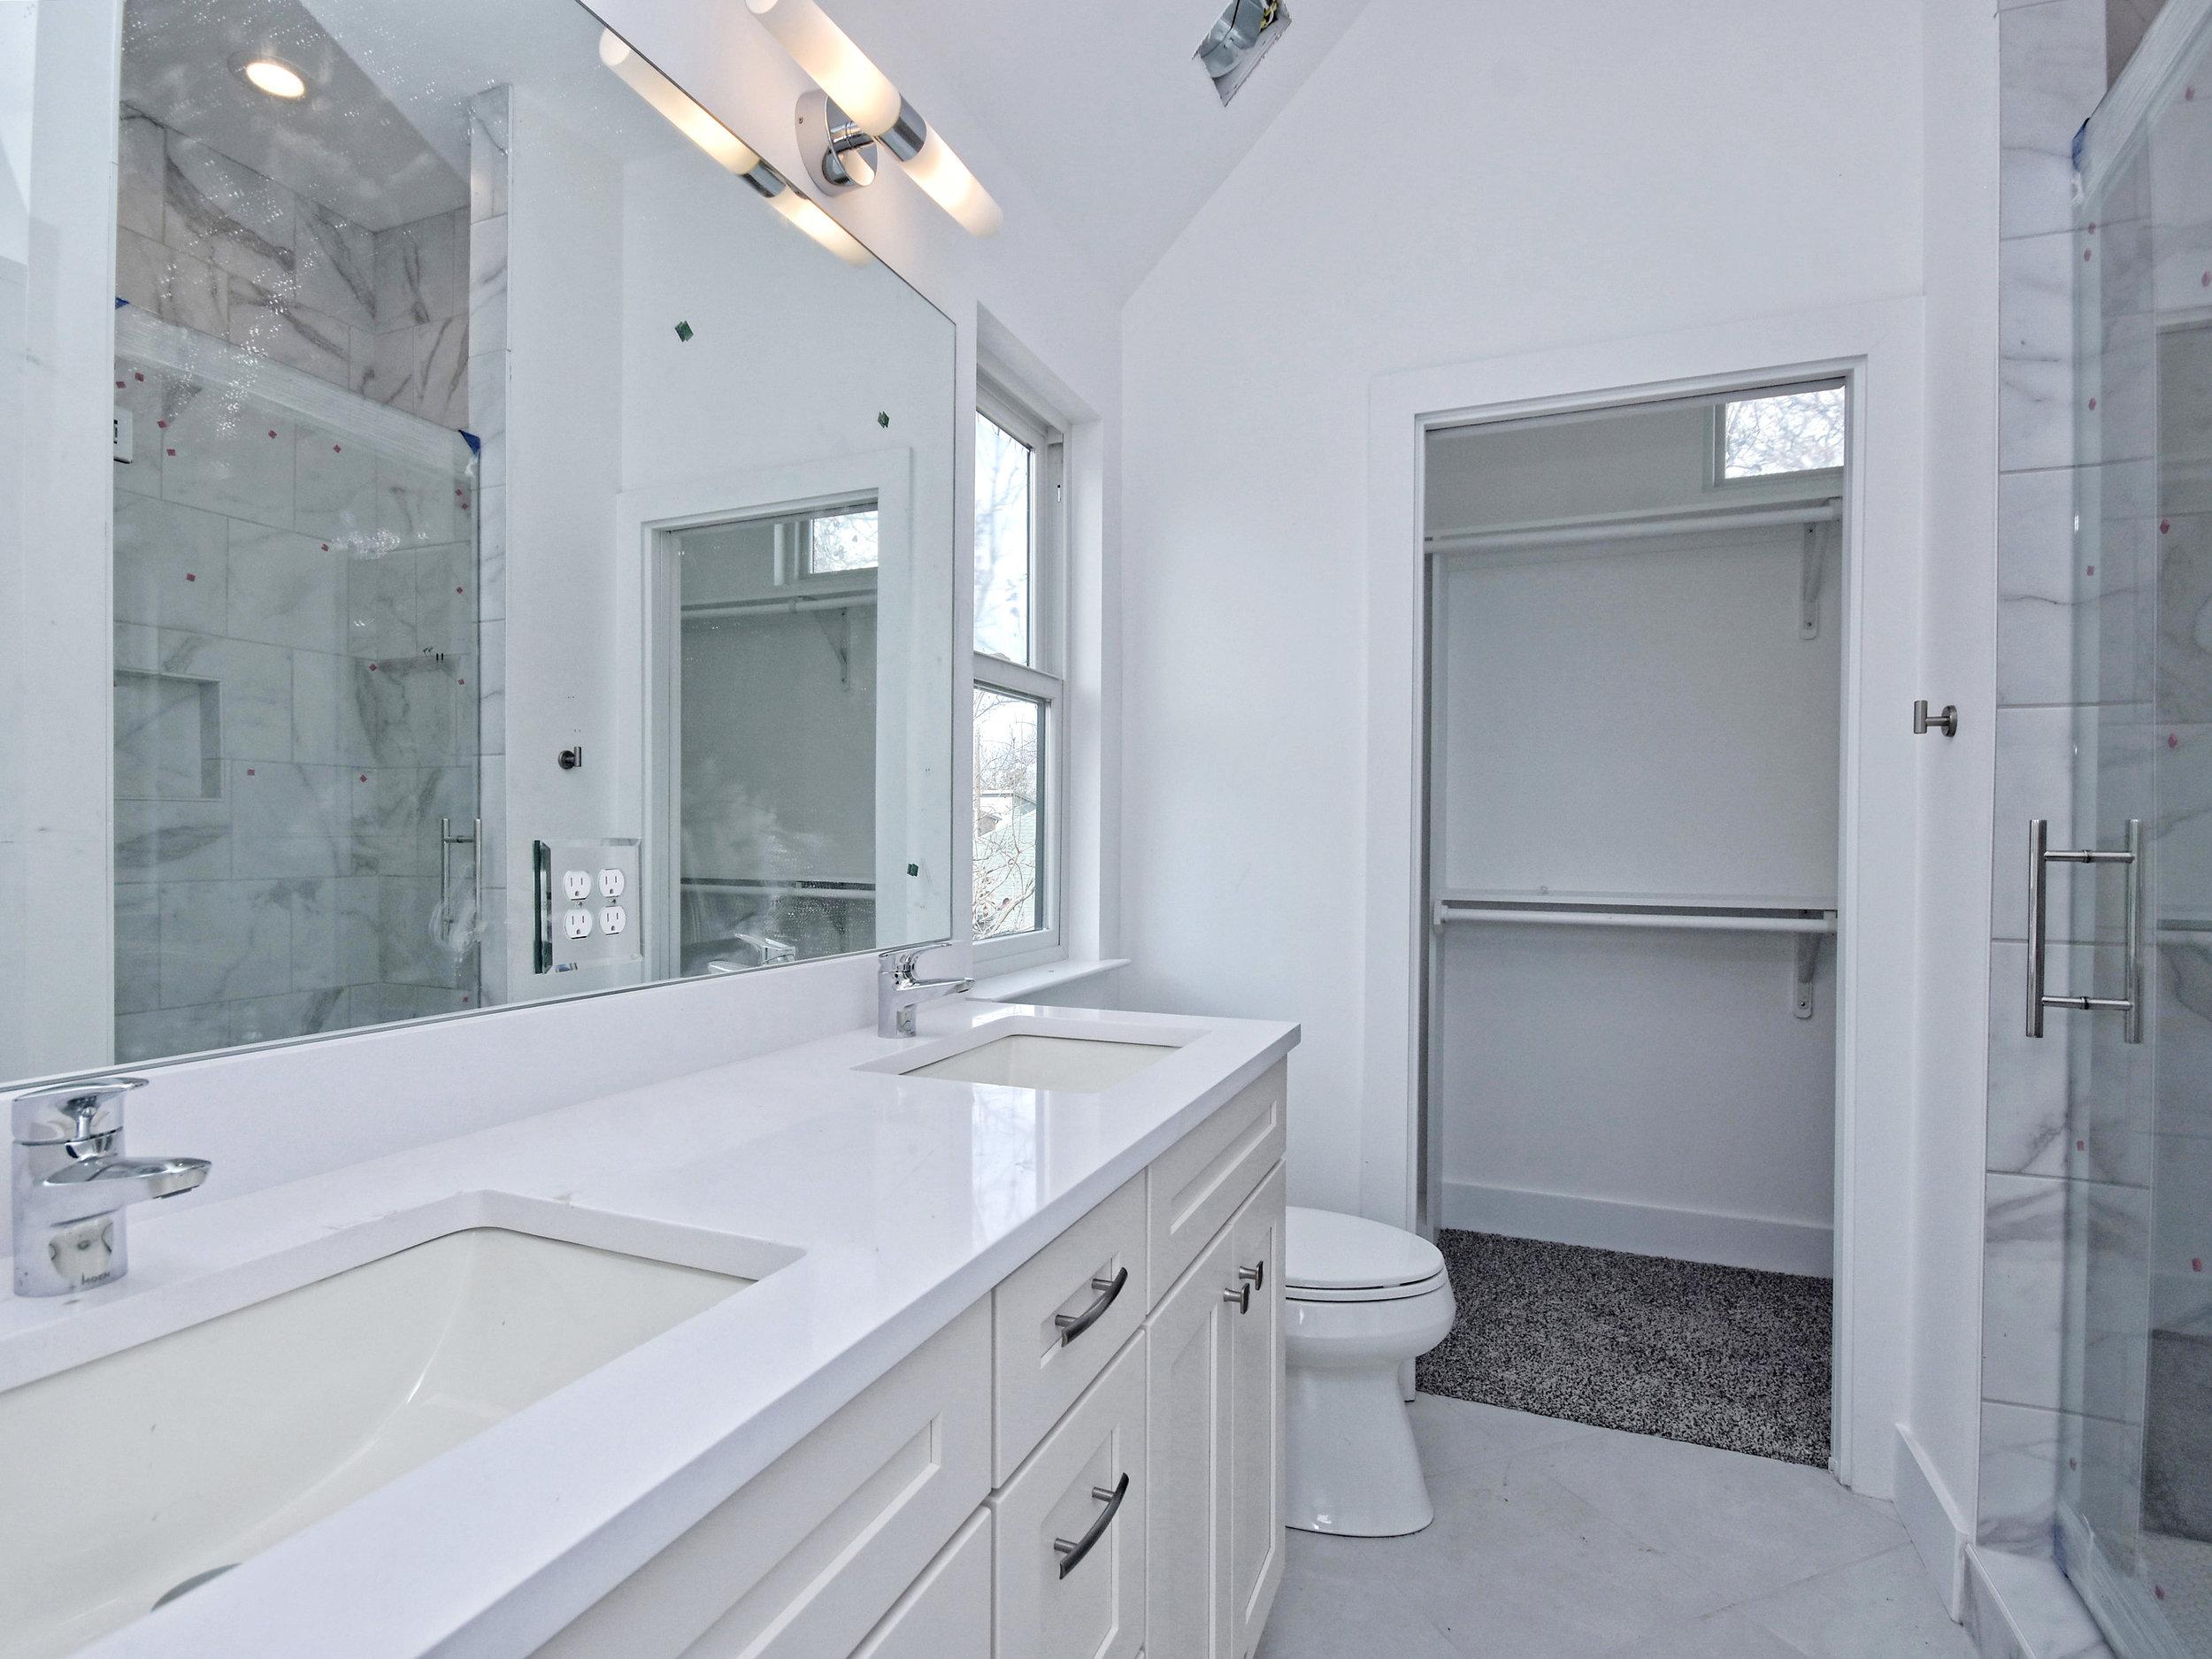 037_B-Master Bathroom.jpg